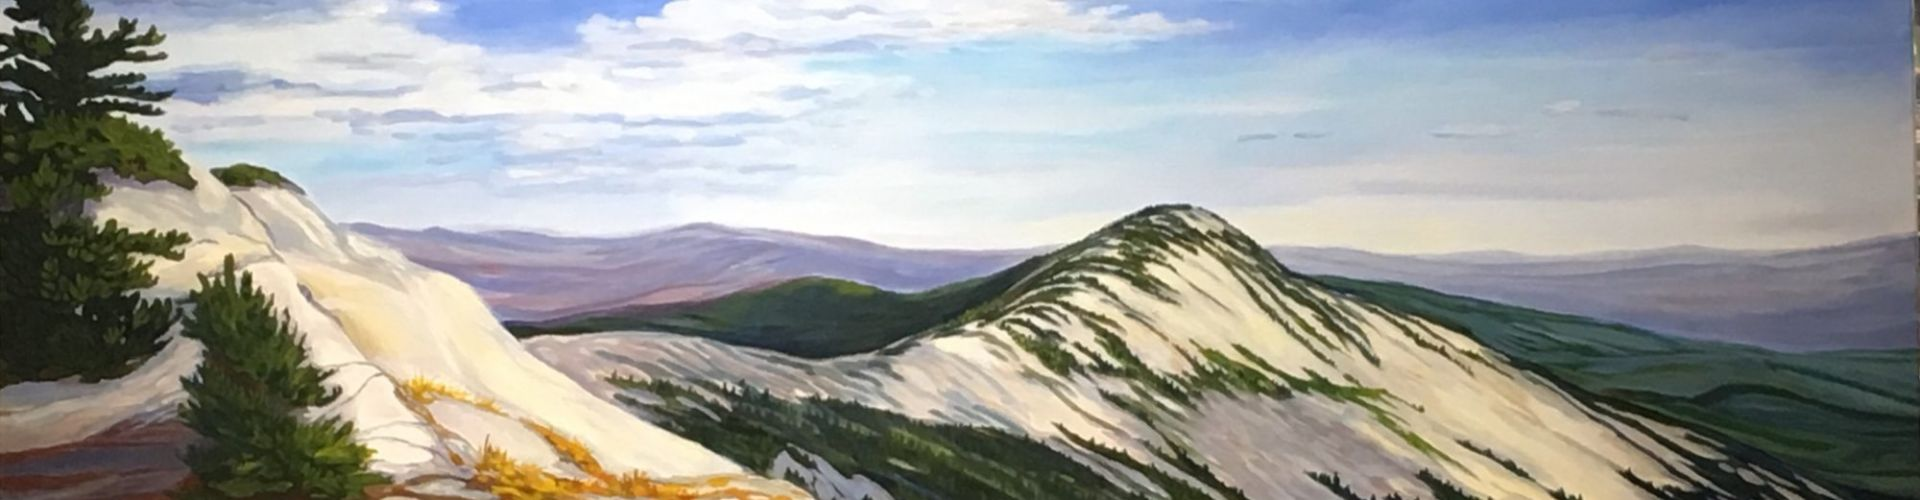 Big White painting by Linda Lovisa